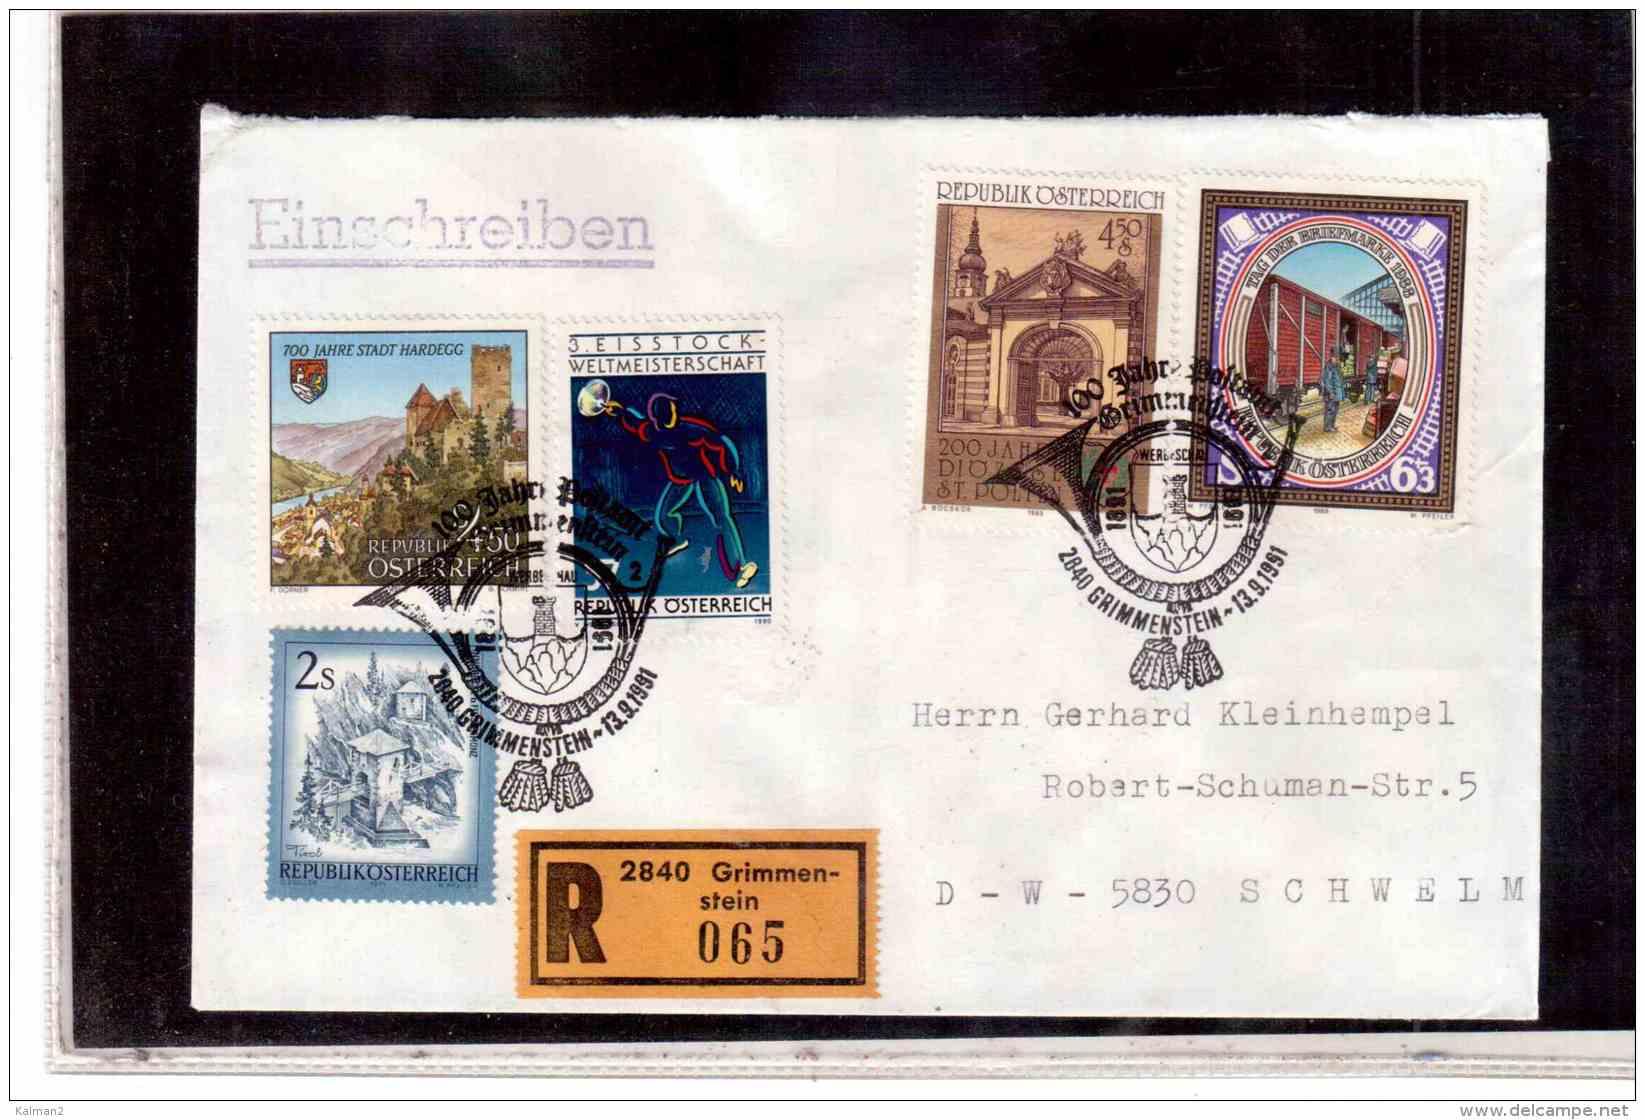 TEM9249 -   GRIMMENSTEIN 13.9.91    /  REGISTERED COVER WITH INTERESTING POSTAGE -100 JAHRE POSTAMT - Post